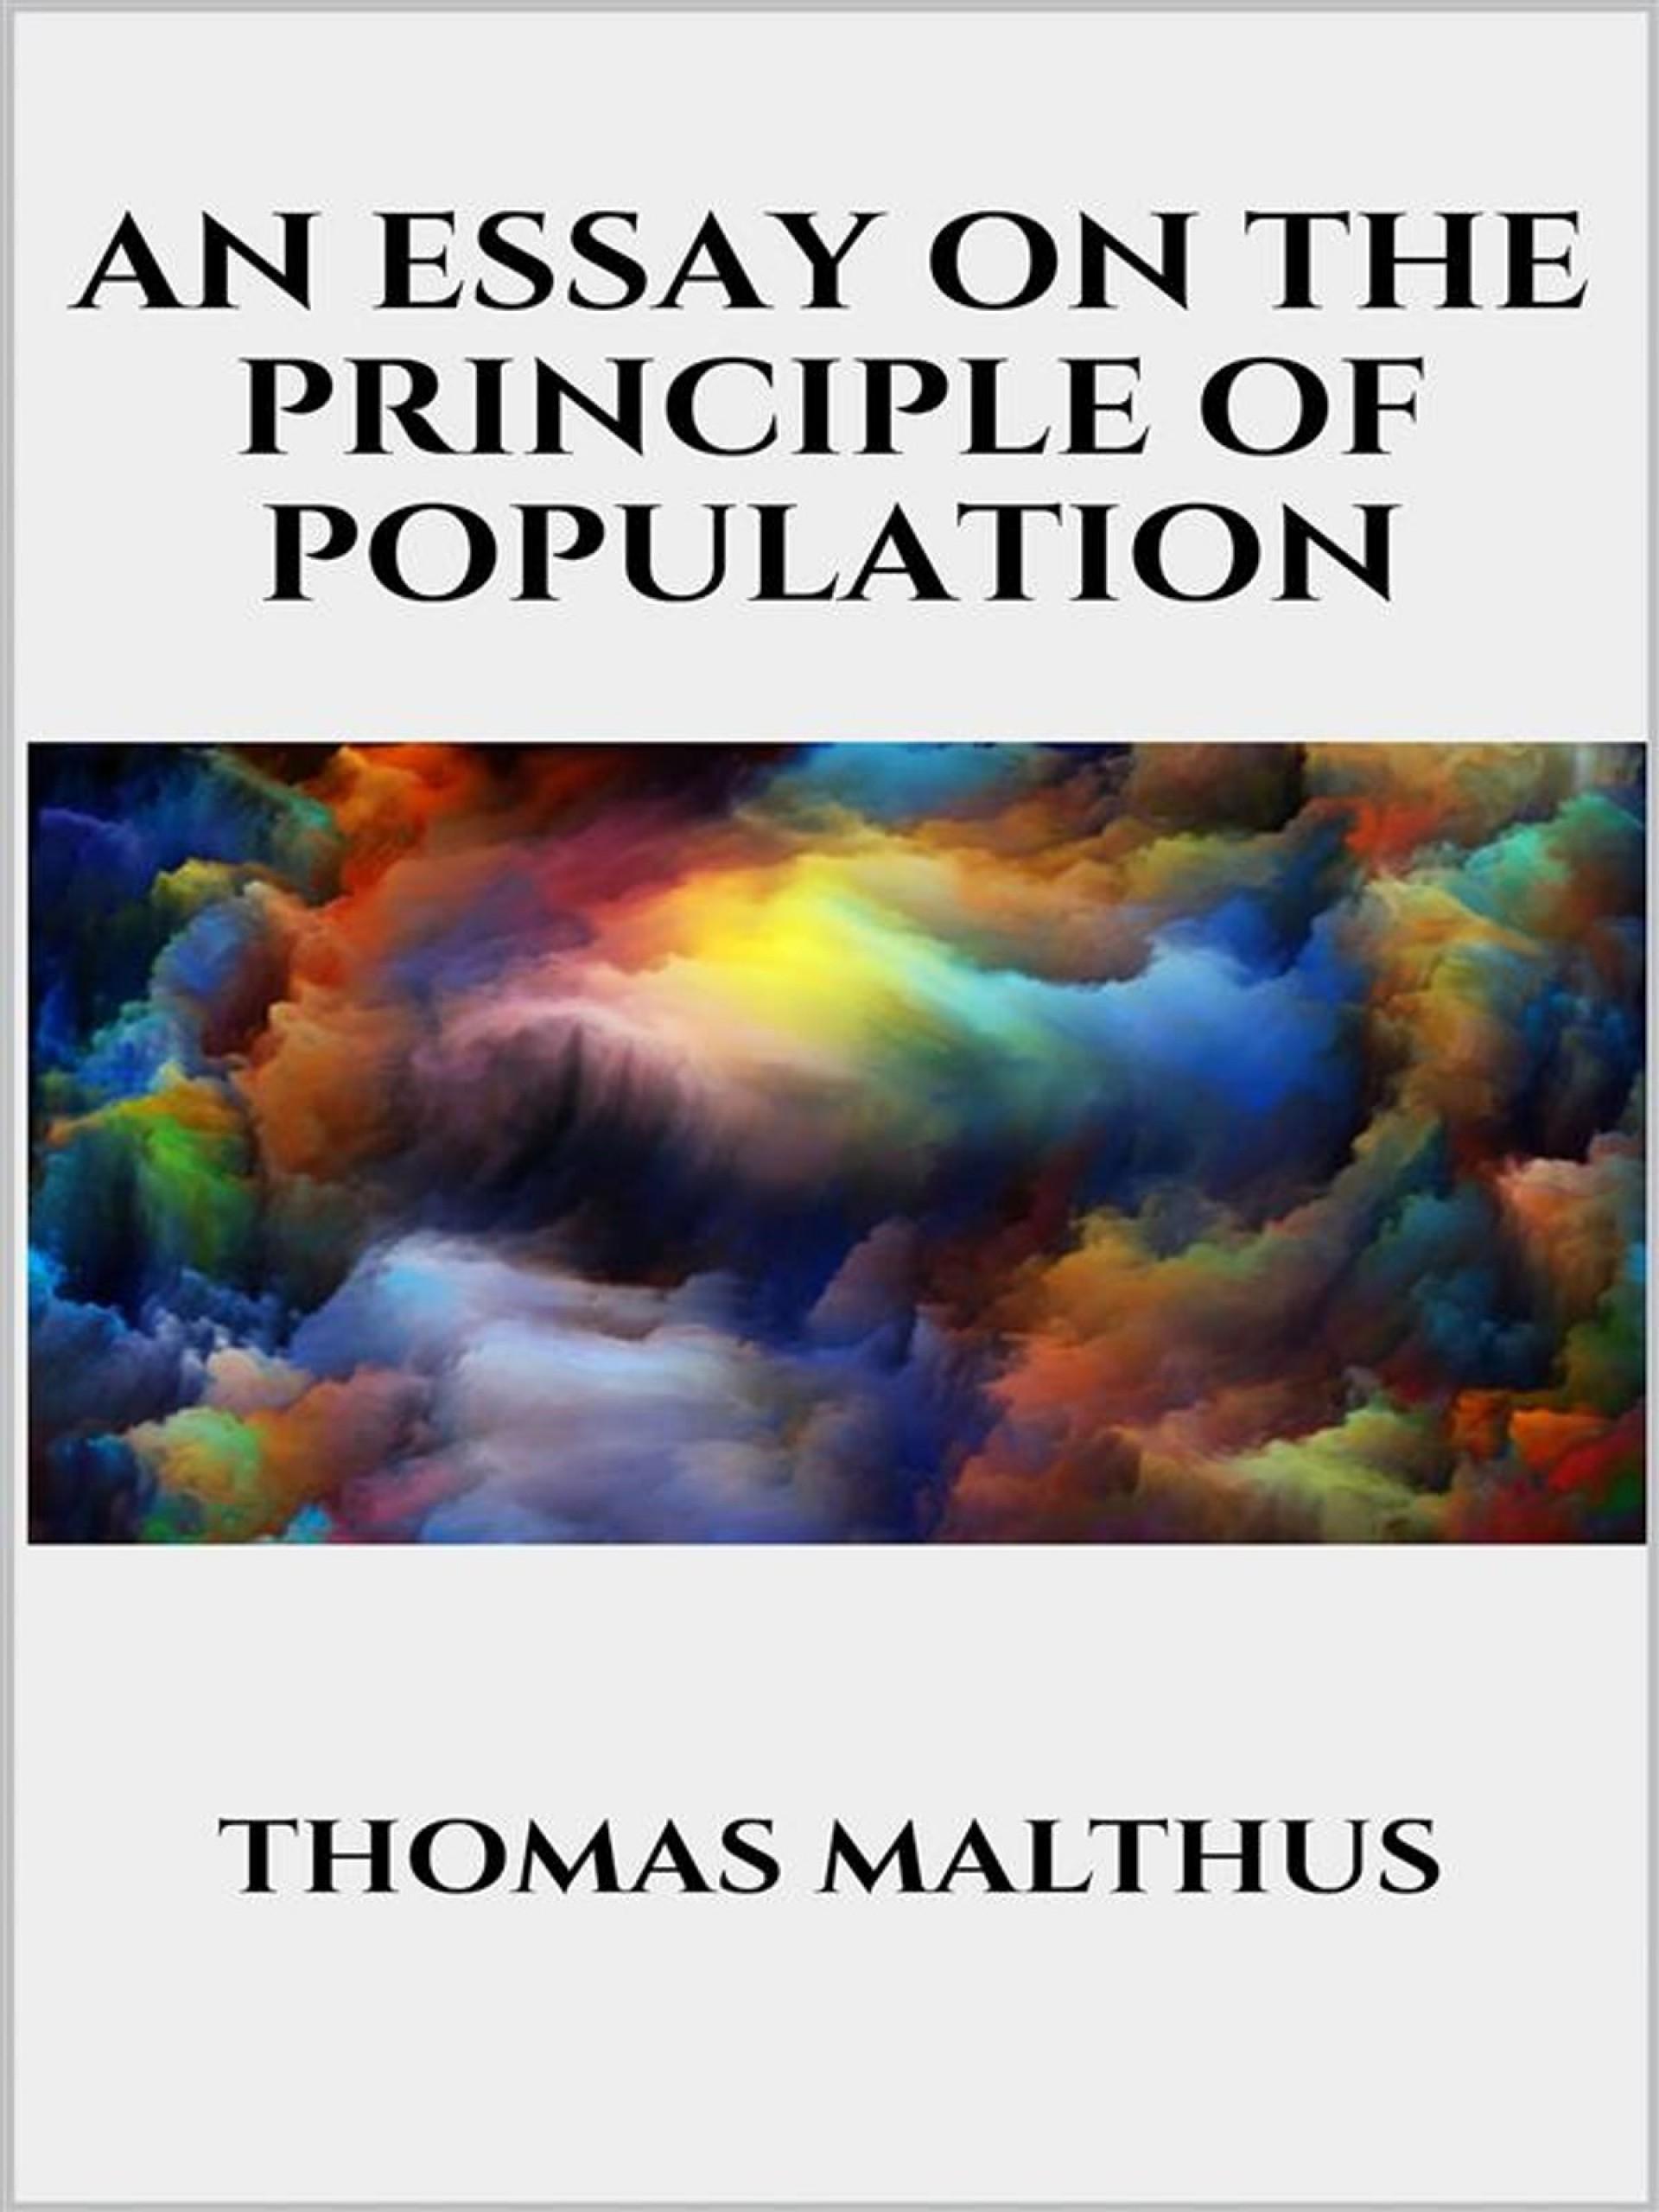 016 Thomas Malthus Essay On The Principle Of Population An Stupendous After Reading Malthus's Principles Darwin Got Idea That Ap Euro 1920